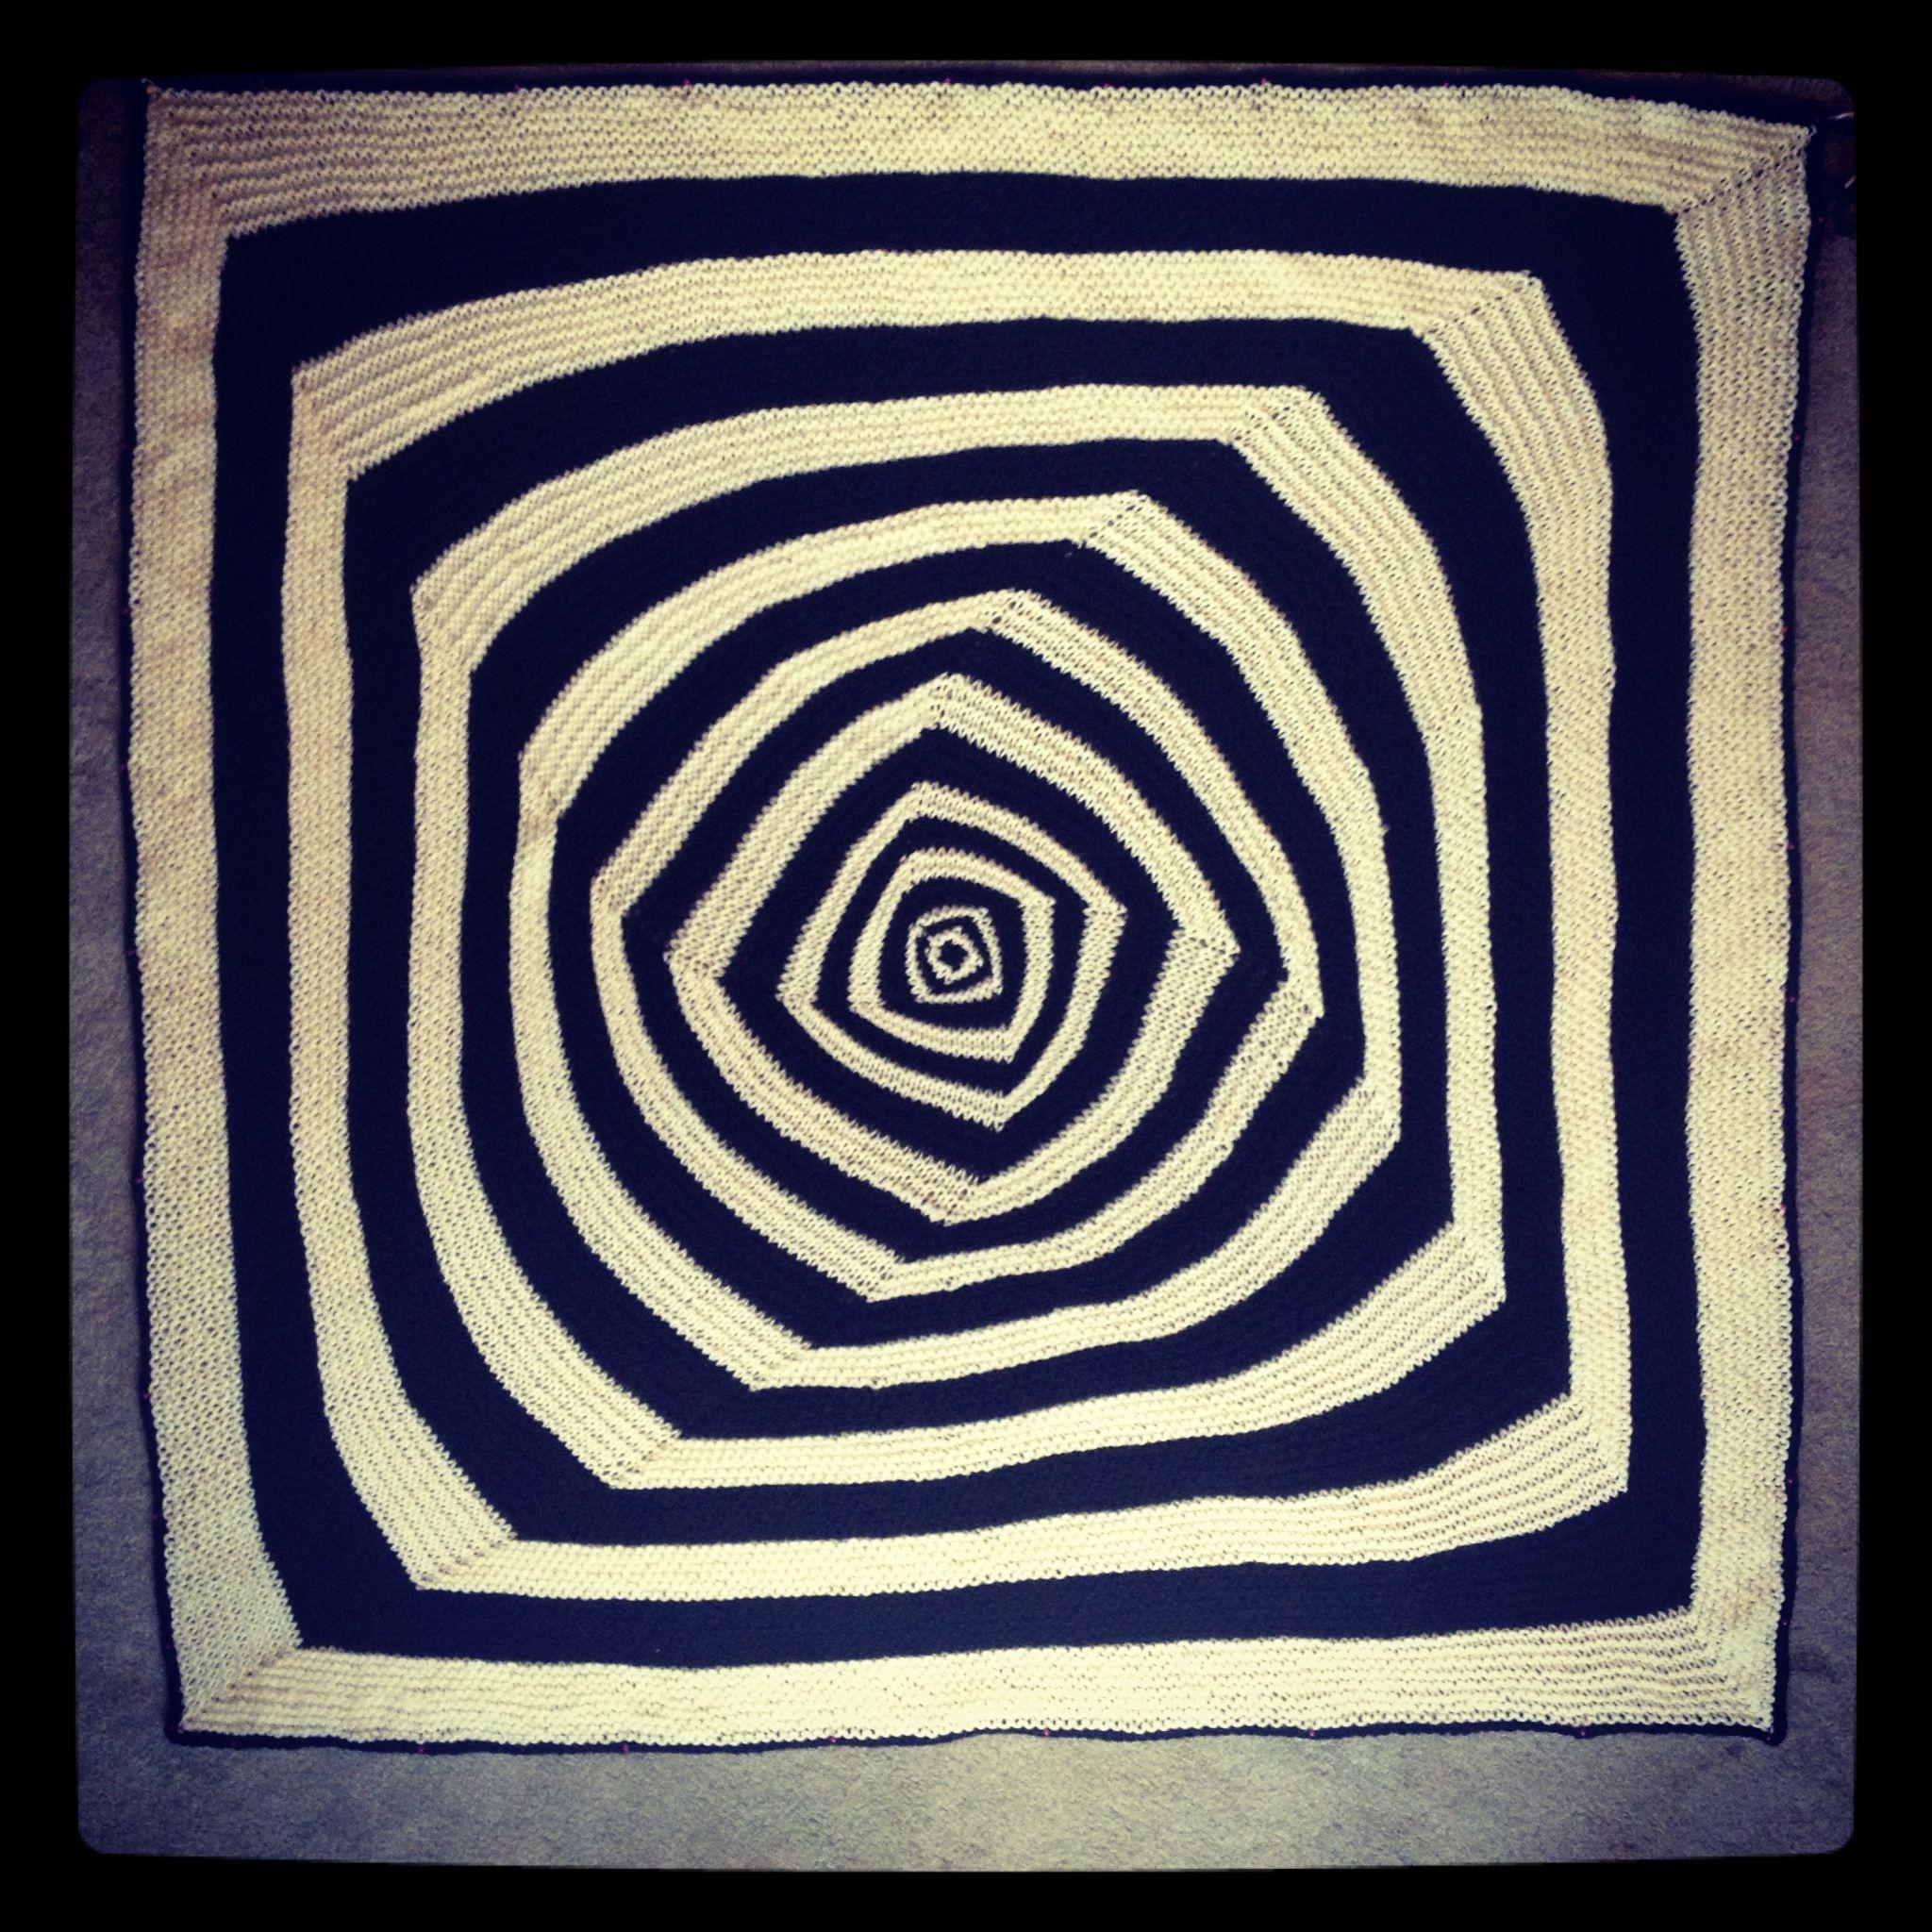 hand knit op art baby blanket pattern designed by marisa dominguez ...